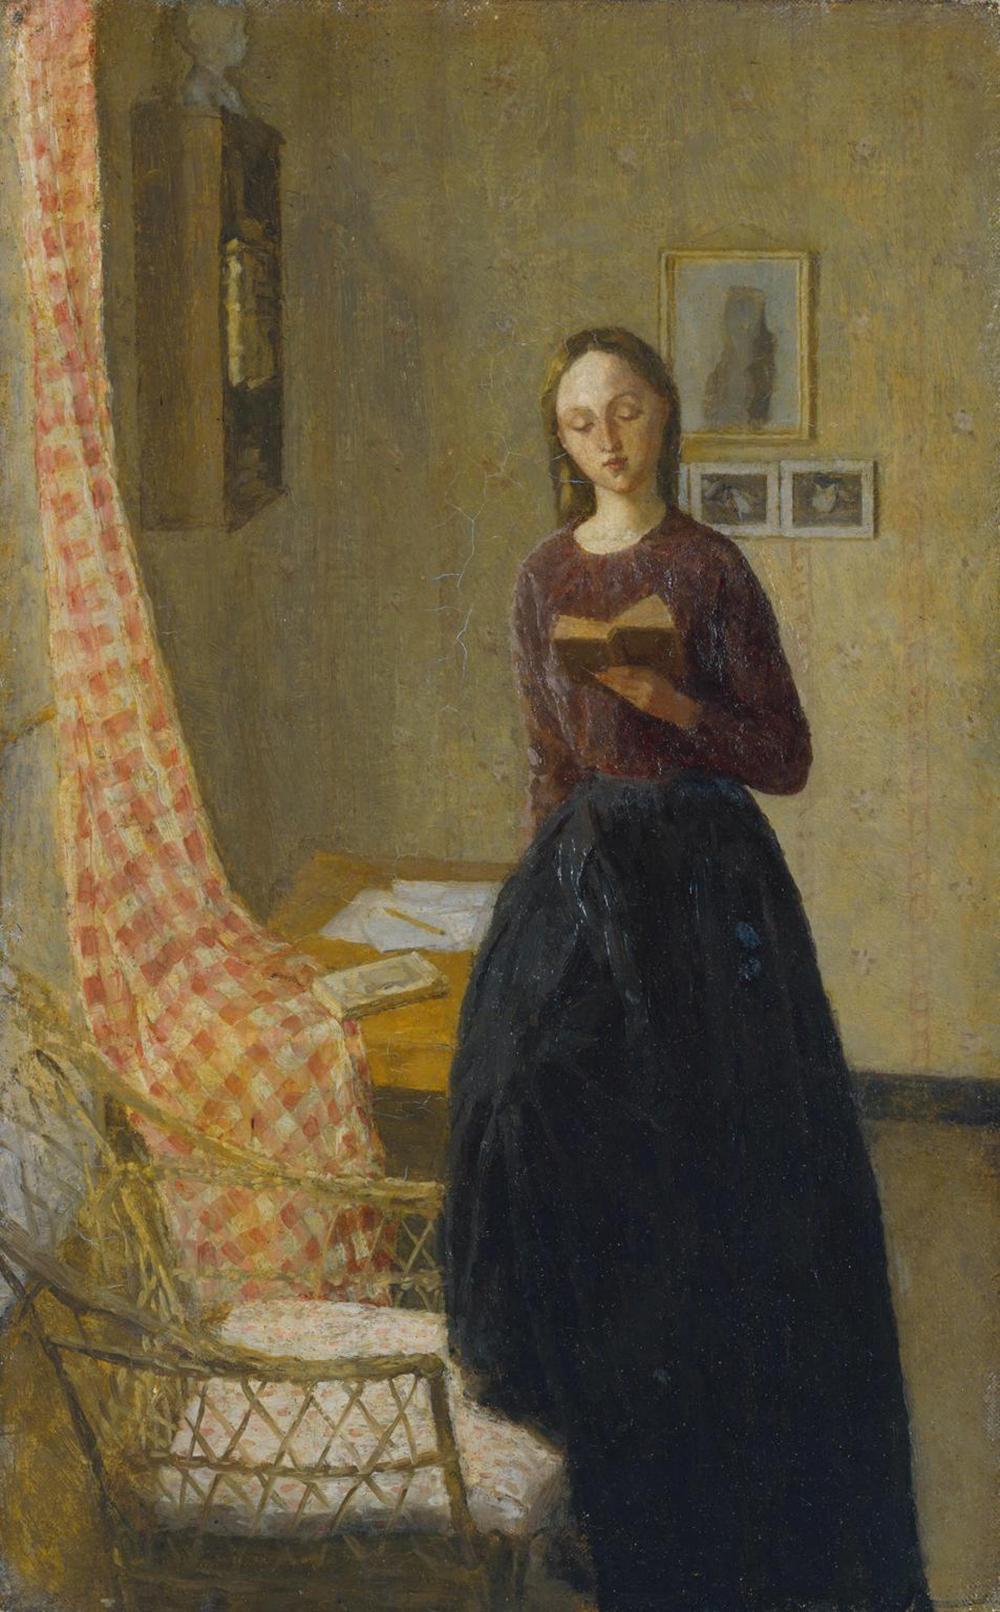 A Lady Reading, by Gwen John, c. 1901. Photograph © Tate (CC-BY-NC-ND 3.0).